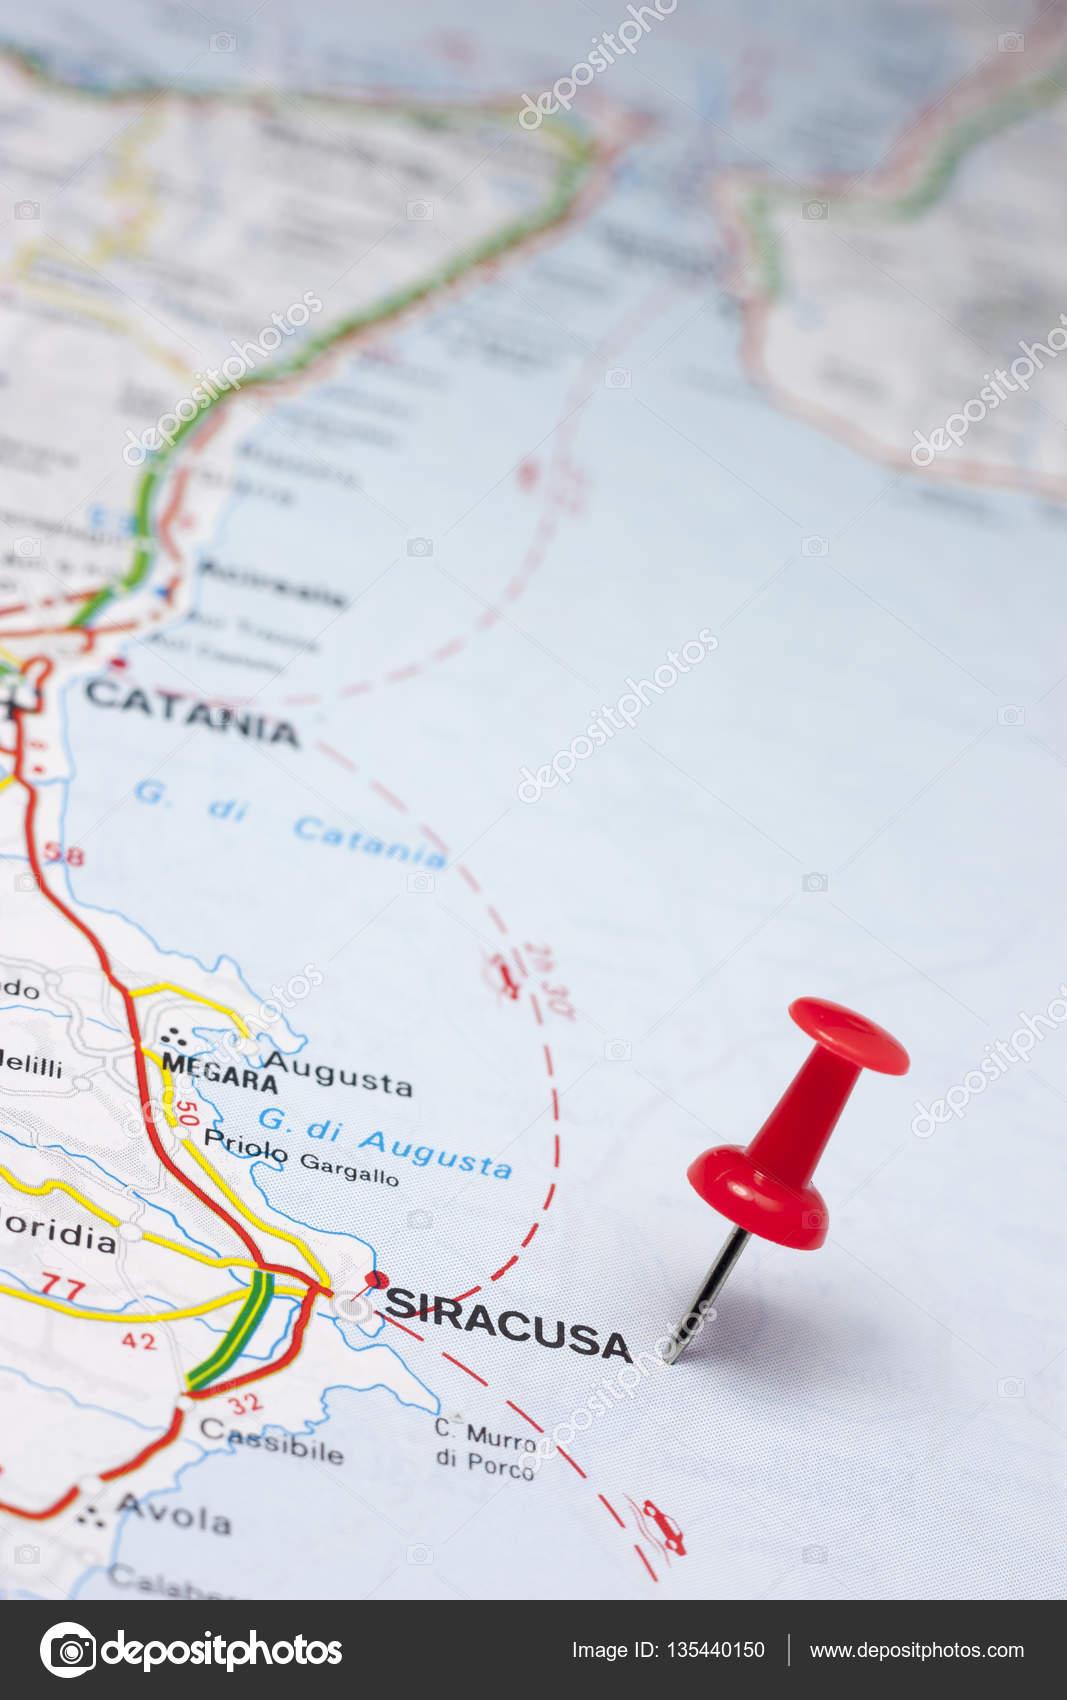 Syracuse Italy On A Map Stock Photo maior 135440150